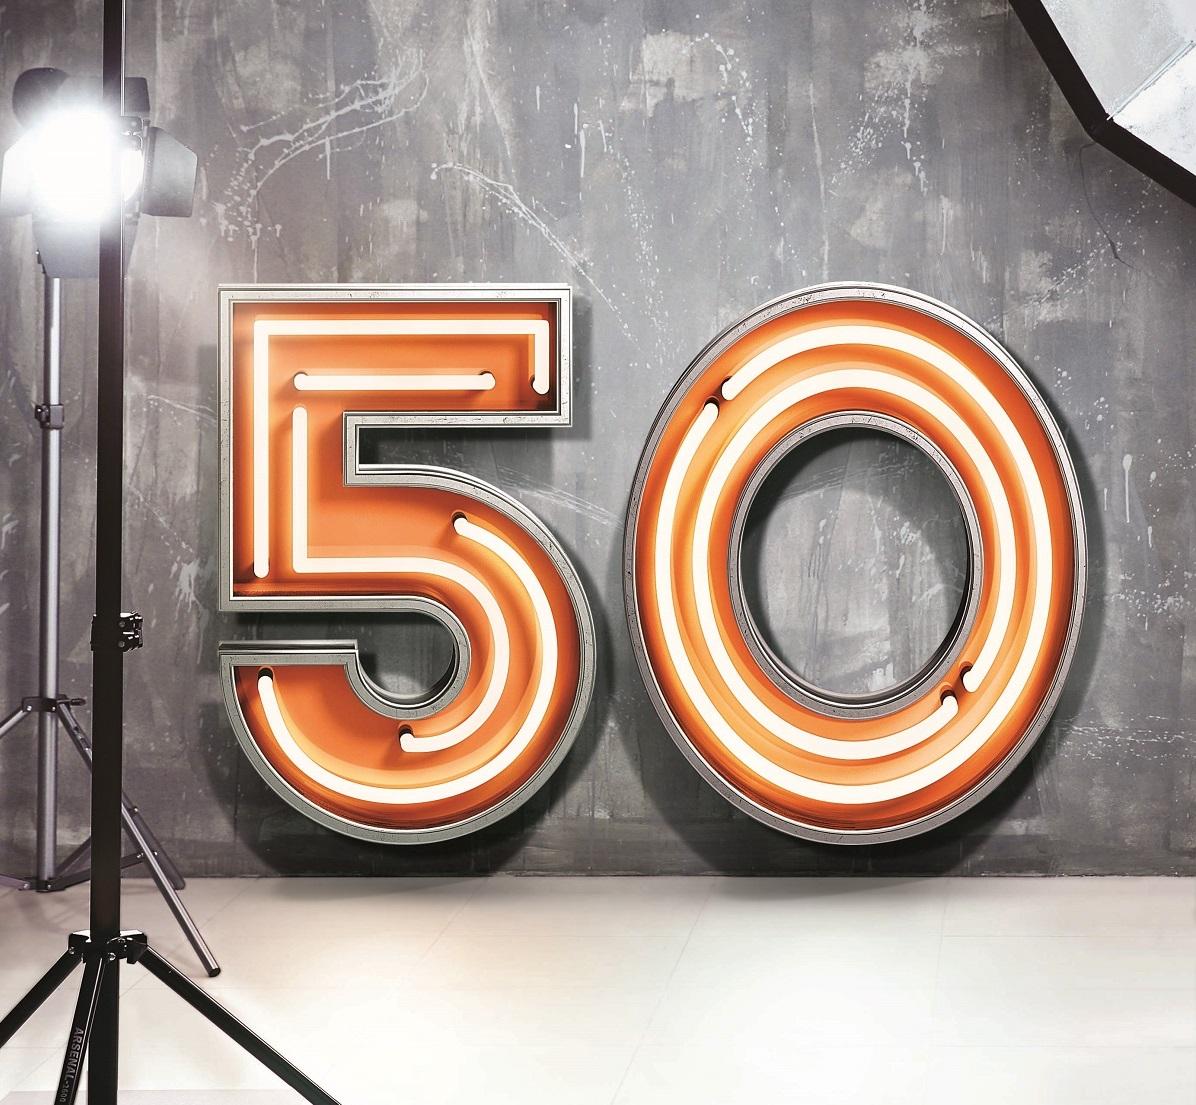 Revealed: Commercial Interior Design's Power 50 for 2019